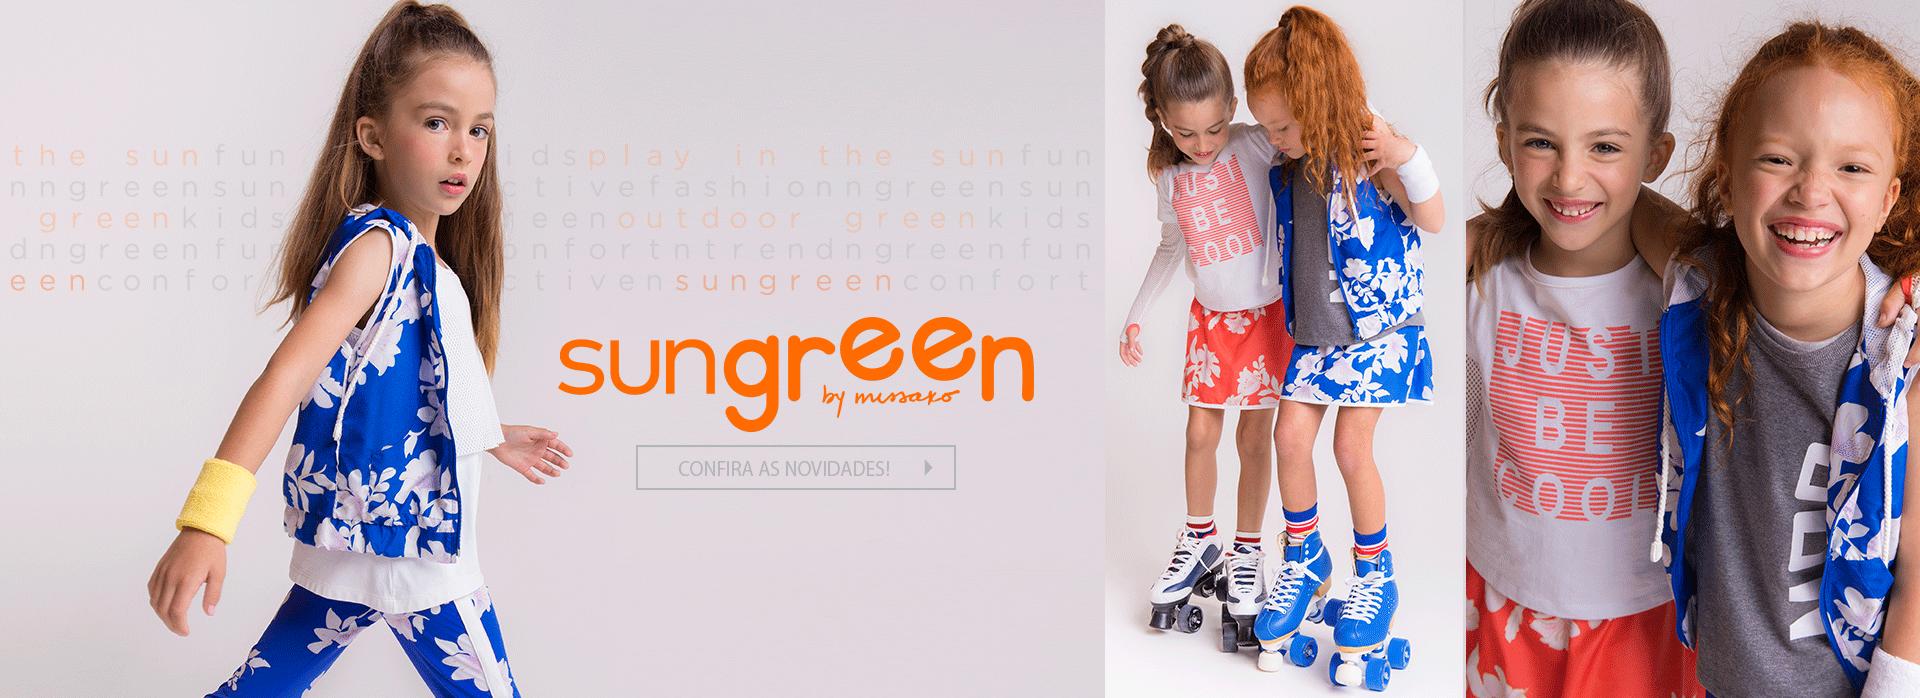 Sungreen 580